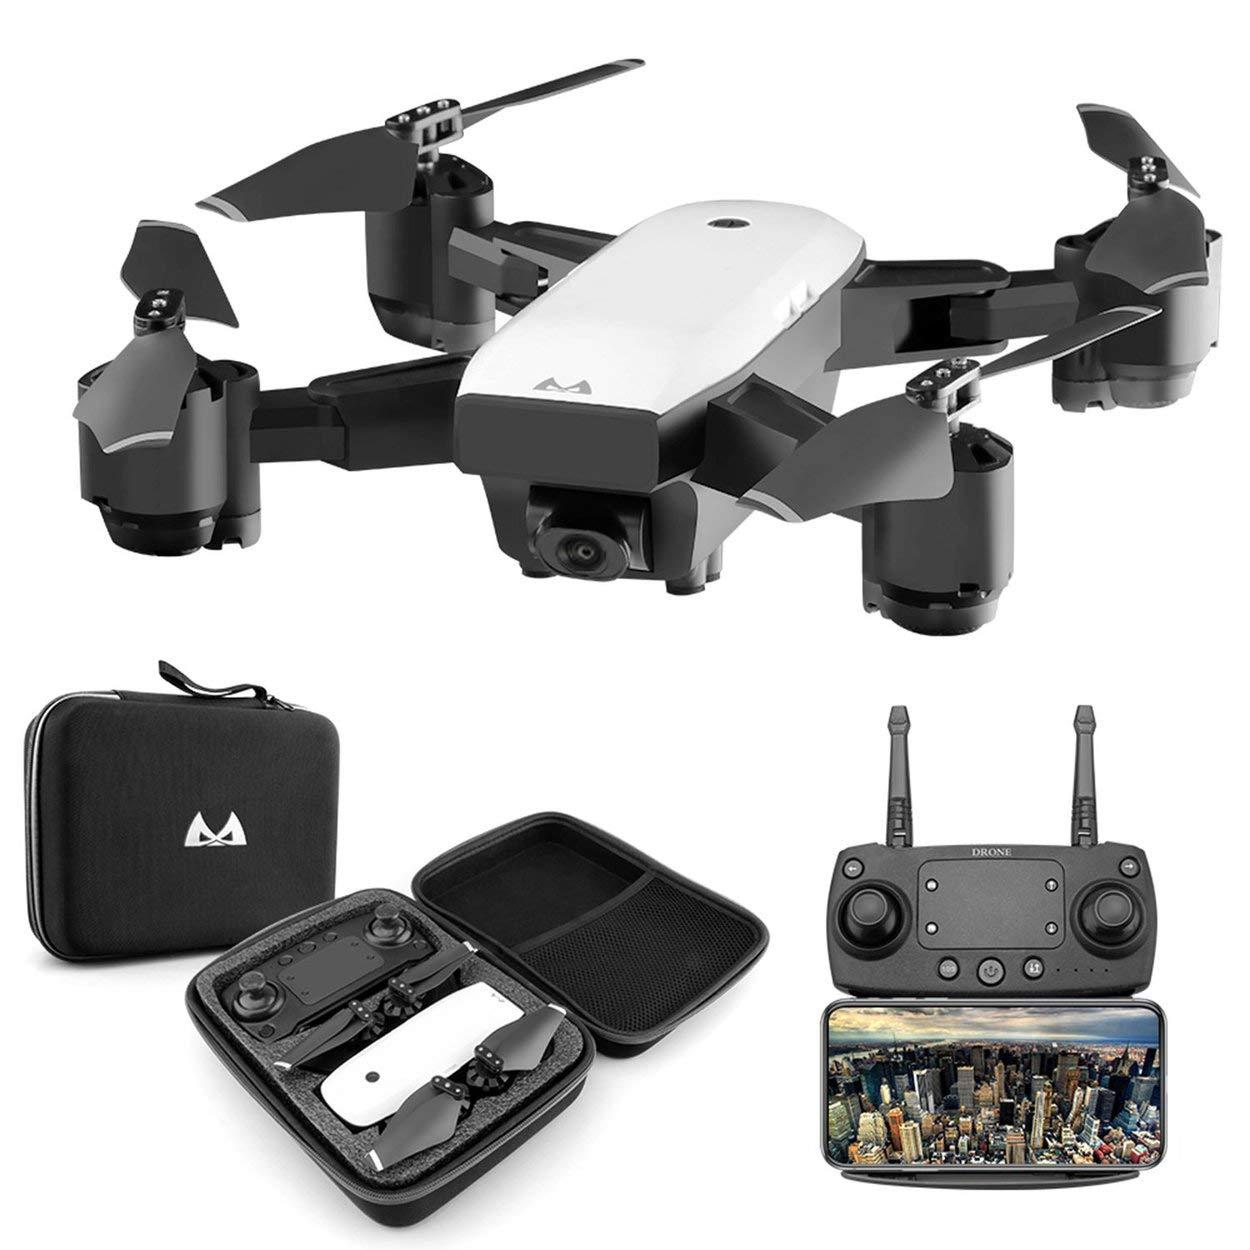 Lorenlli Fit SMRC S20 6 Achsen Gyro FPV Drone Tragbare RC Quadrocopter Mit 720 P Kamera Klapp RC Hubschrauber Portable RC Modell